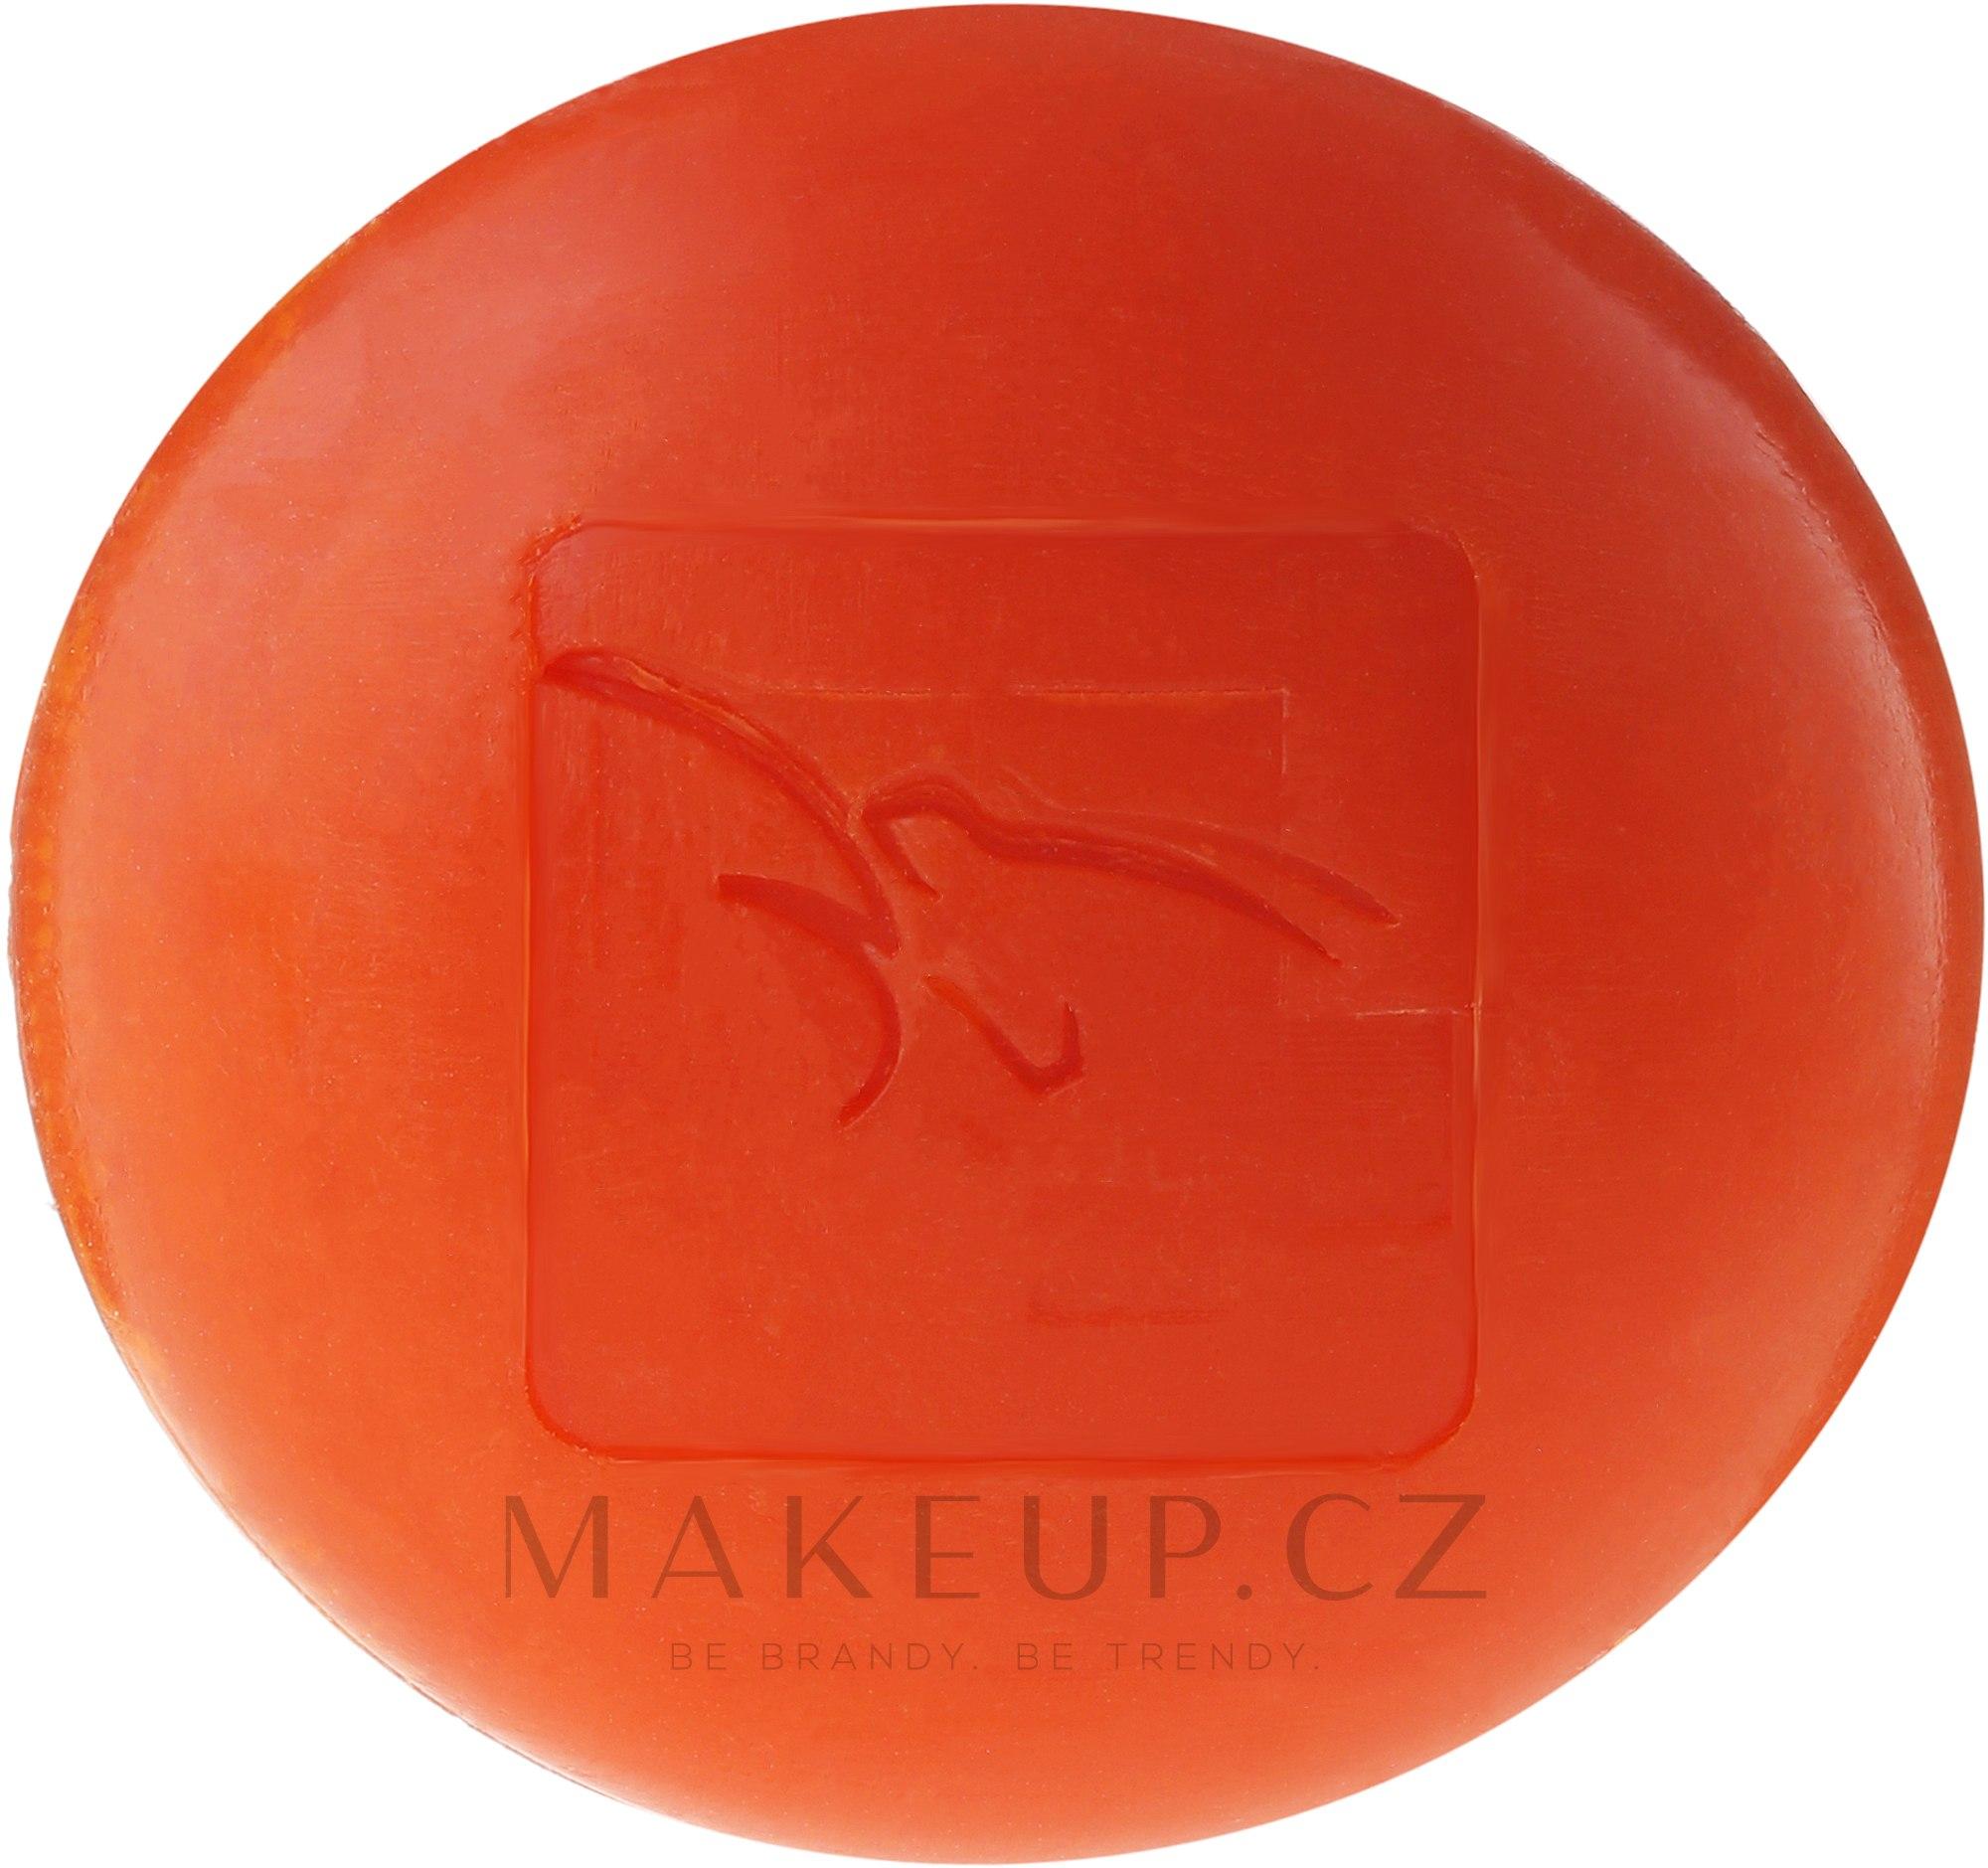 "Mýdlo ""Rajčata a pepř"" - Bialy Jelen Soap Tomato And Pepper — foto 130 g"